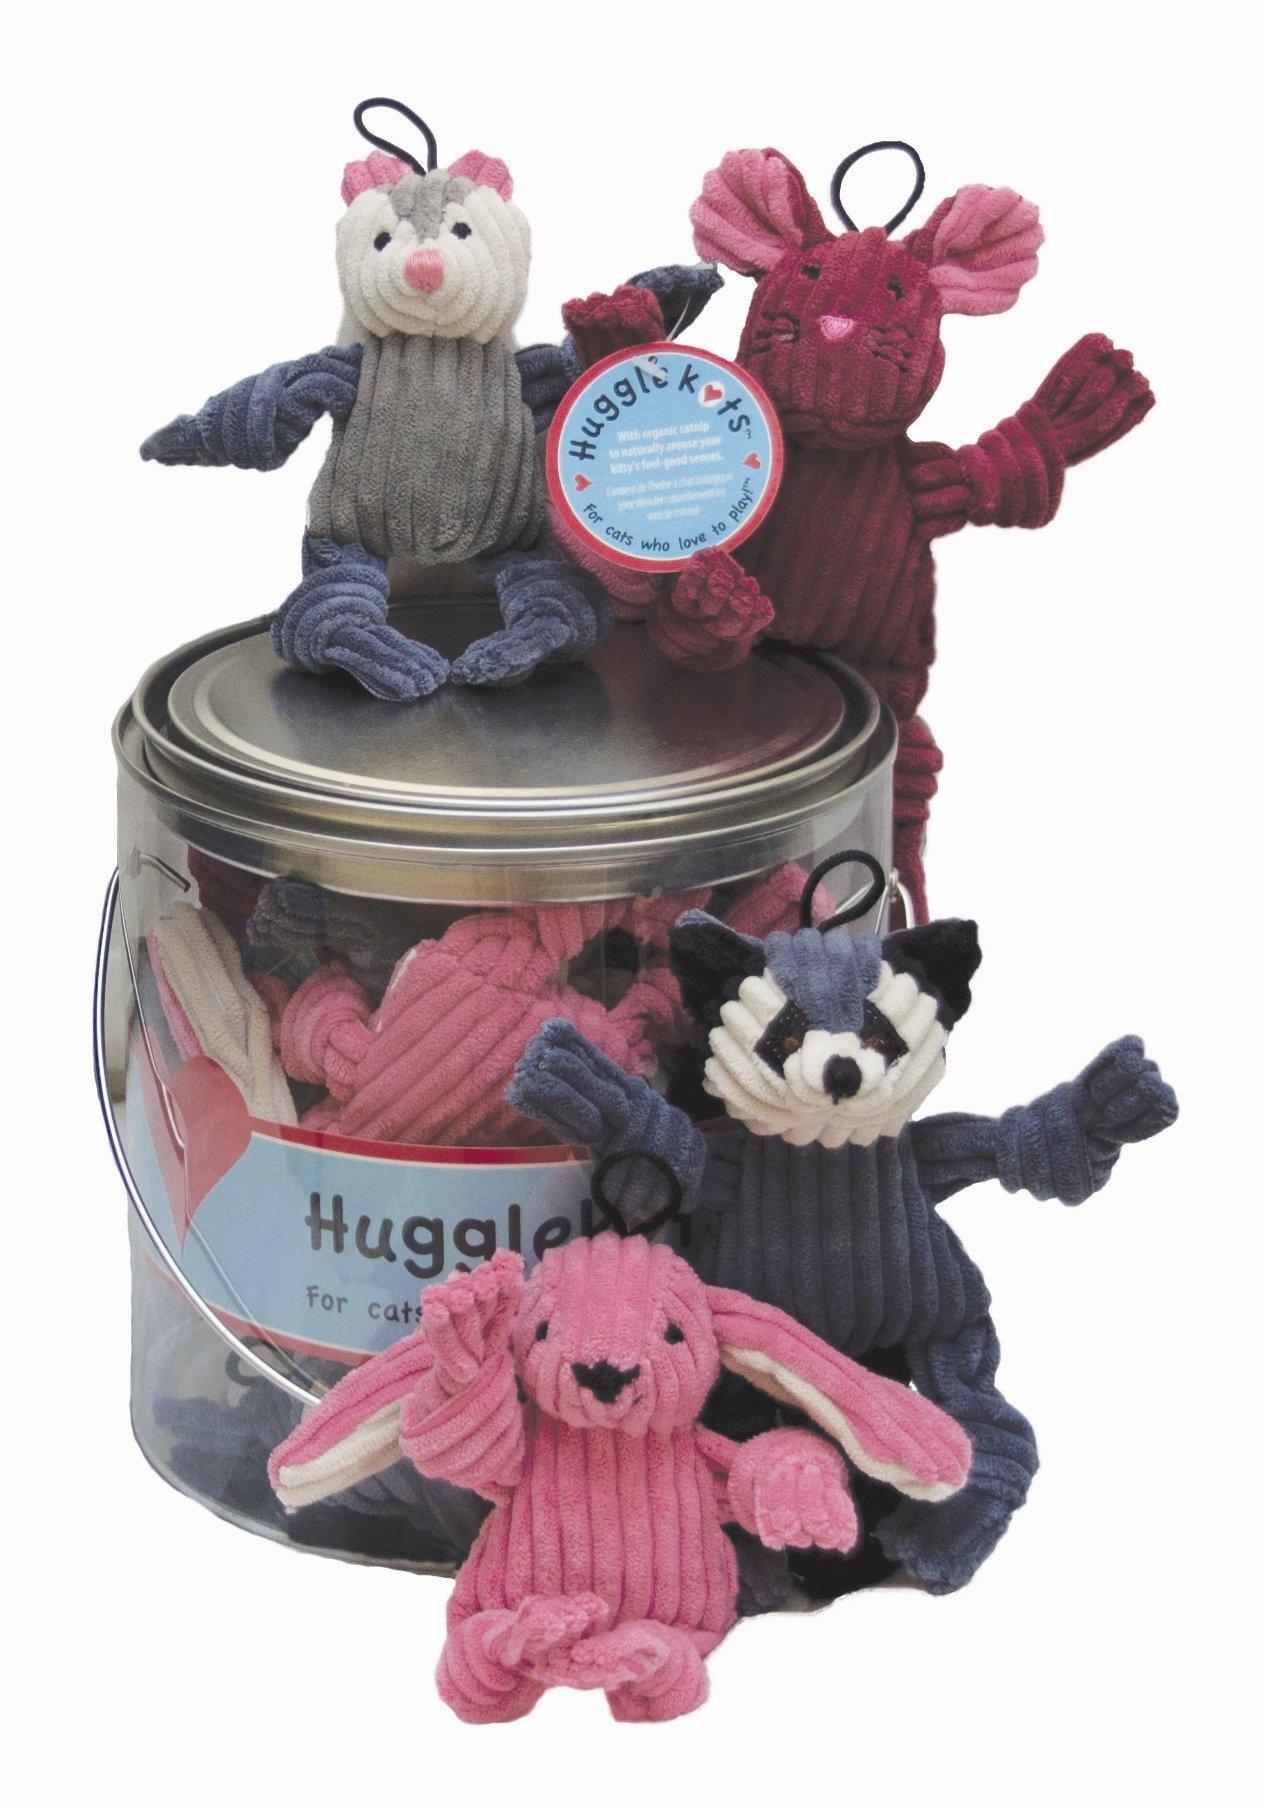 HuggleKats Corduroy with Organic Catnip Woodland Critters Assortment, 12 Count